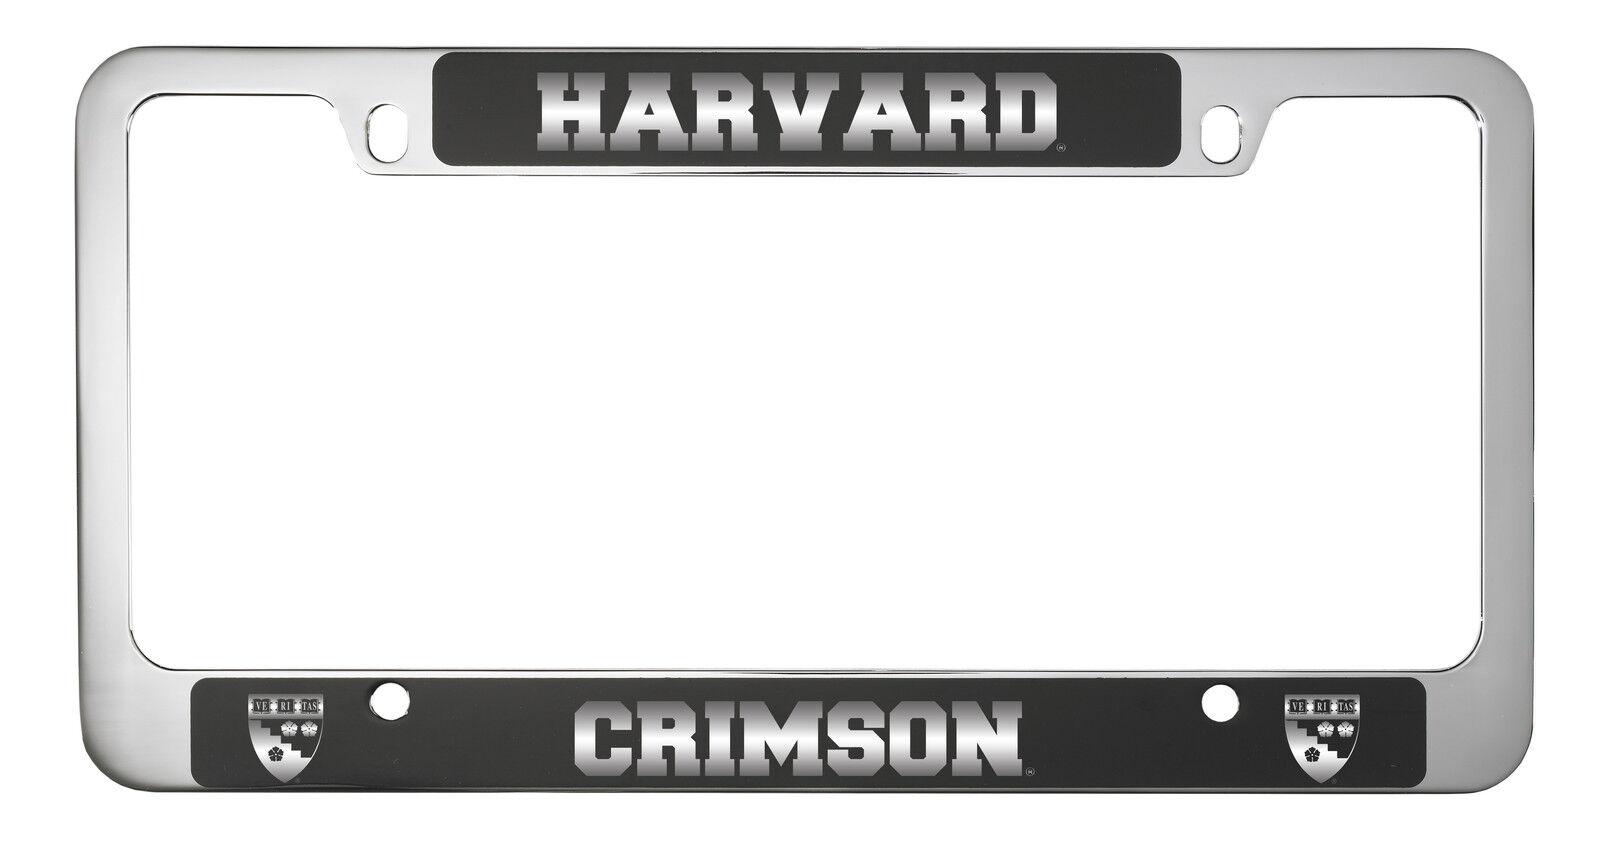 Harvard University -metal License Plate Frame-black | eBay